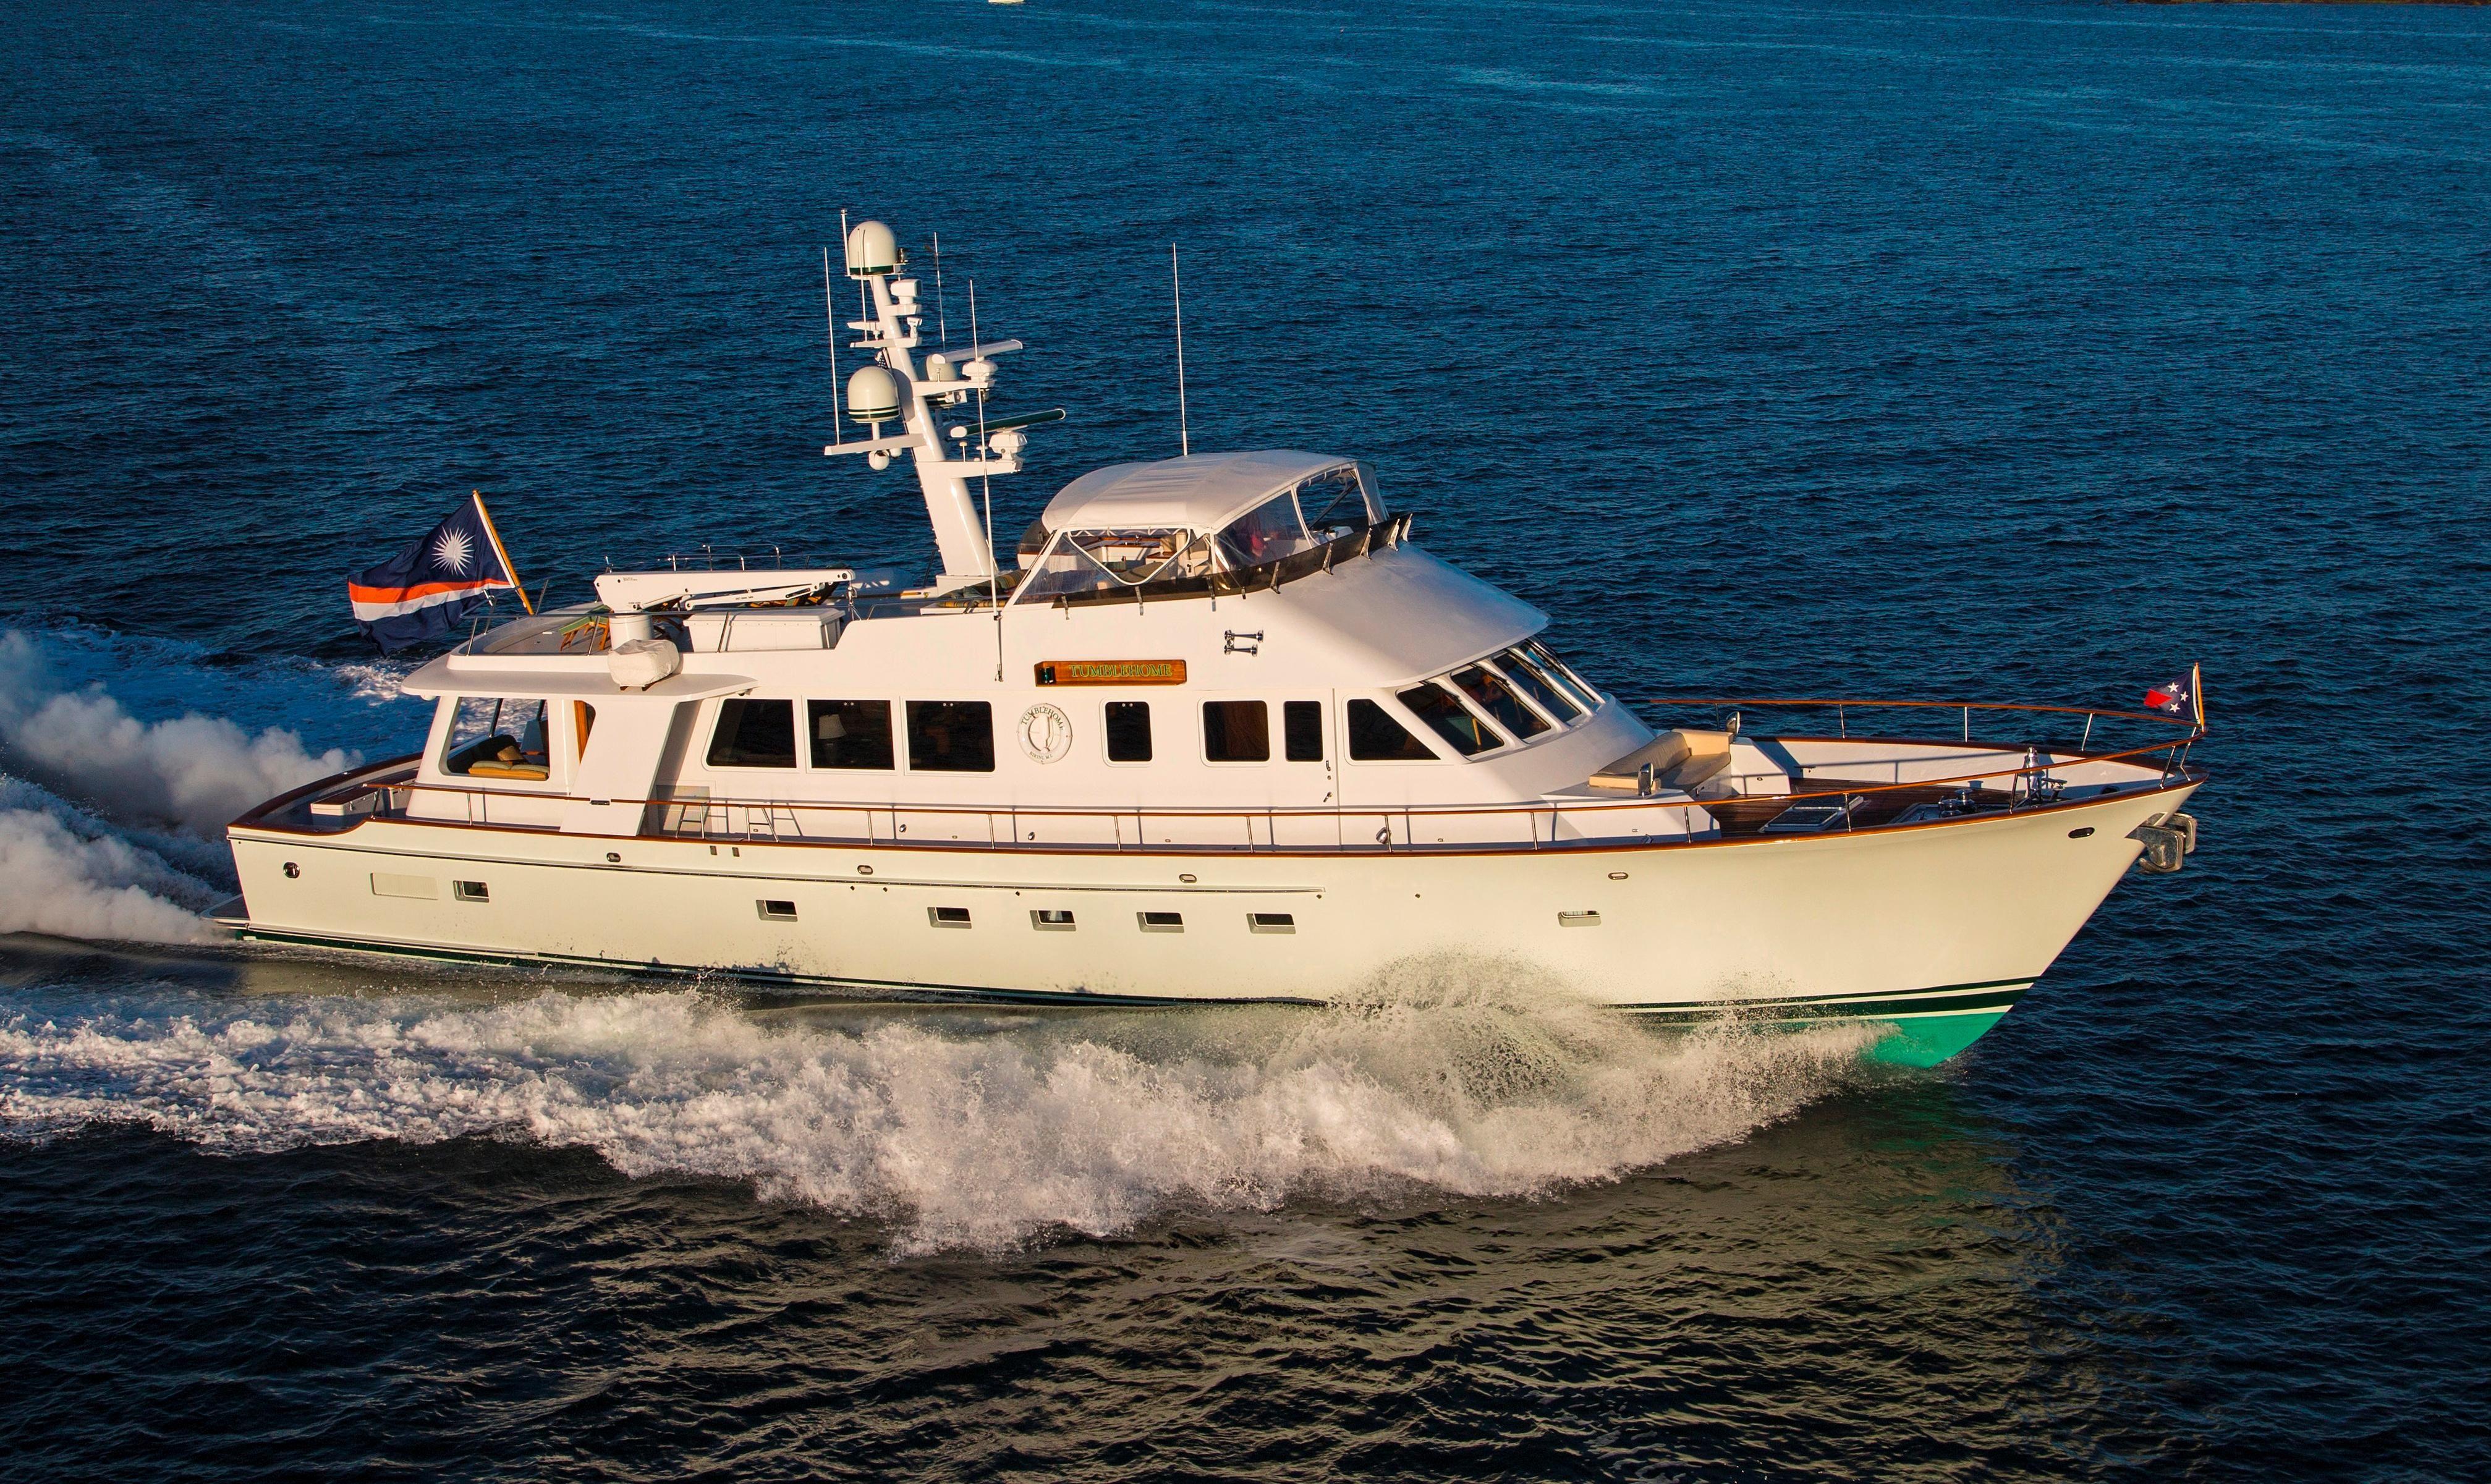 Motor Yacht: 1997 Lyman Morse Motor Yacht Power Boat For Sale